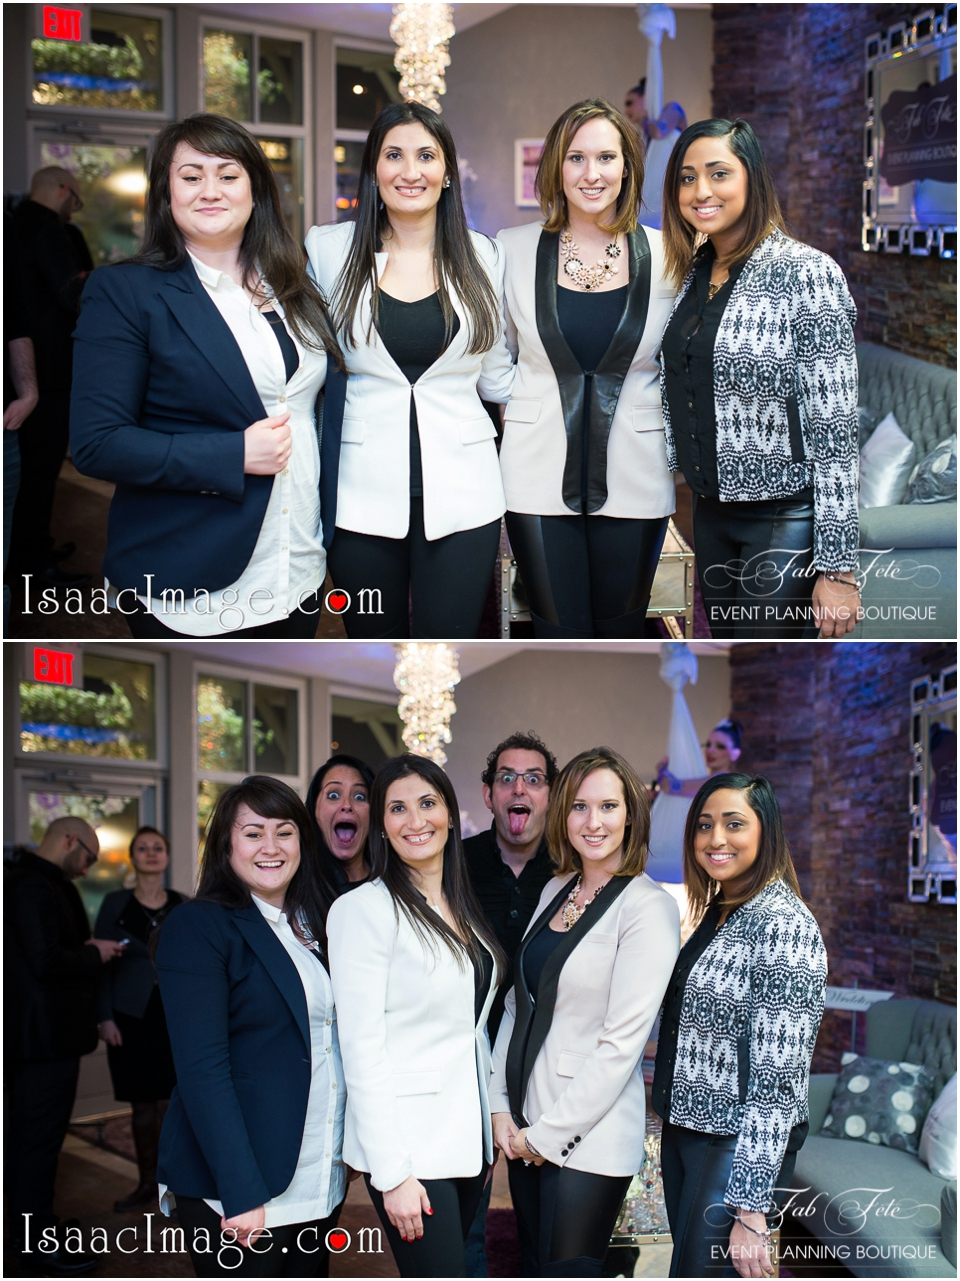 Fab Fete Toronto Wedding Event Planning Boutique open house_6500.jpg